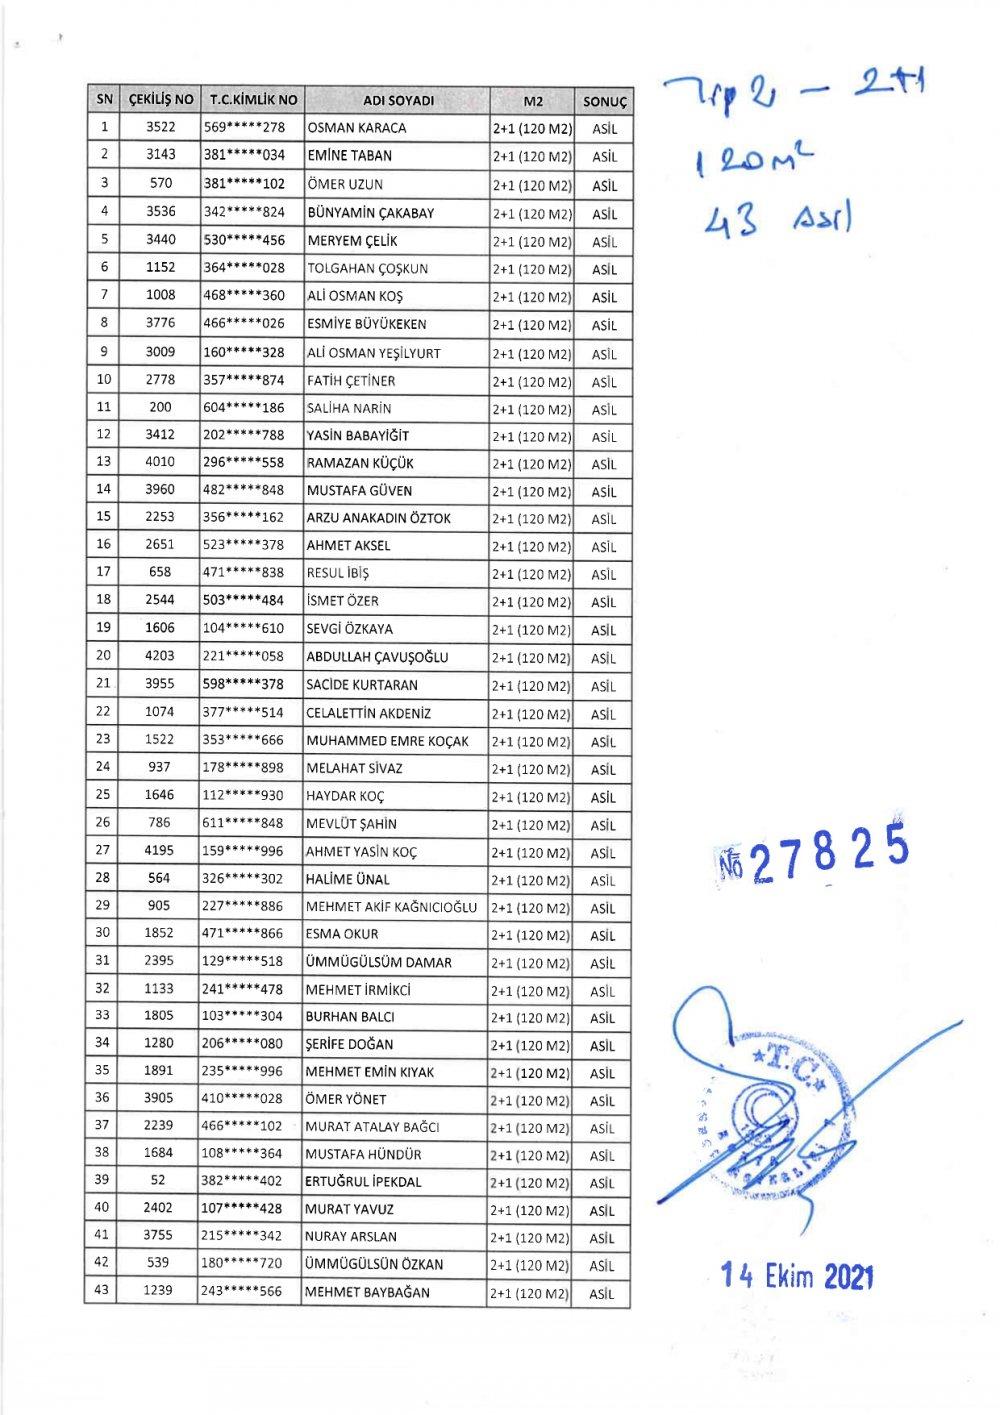 ss-turgutreis-evleri-kyk-kura-cekilis-listesi-page-0004.jpg